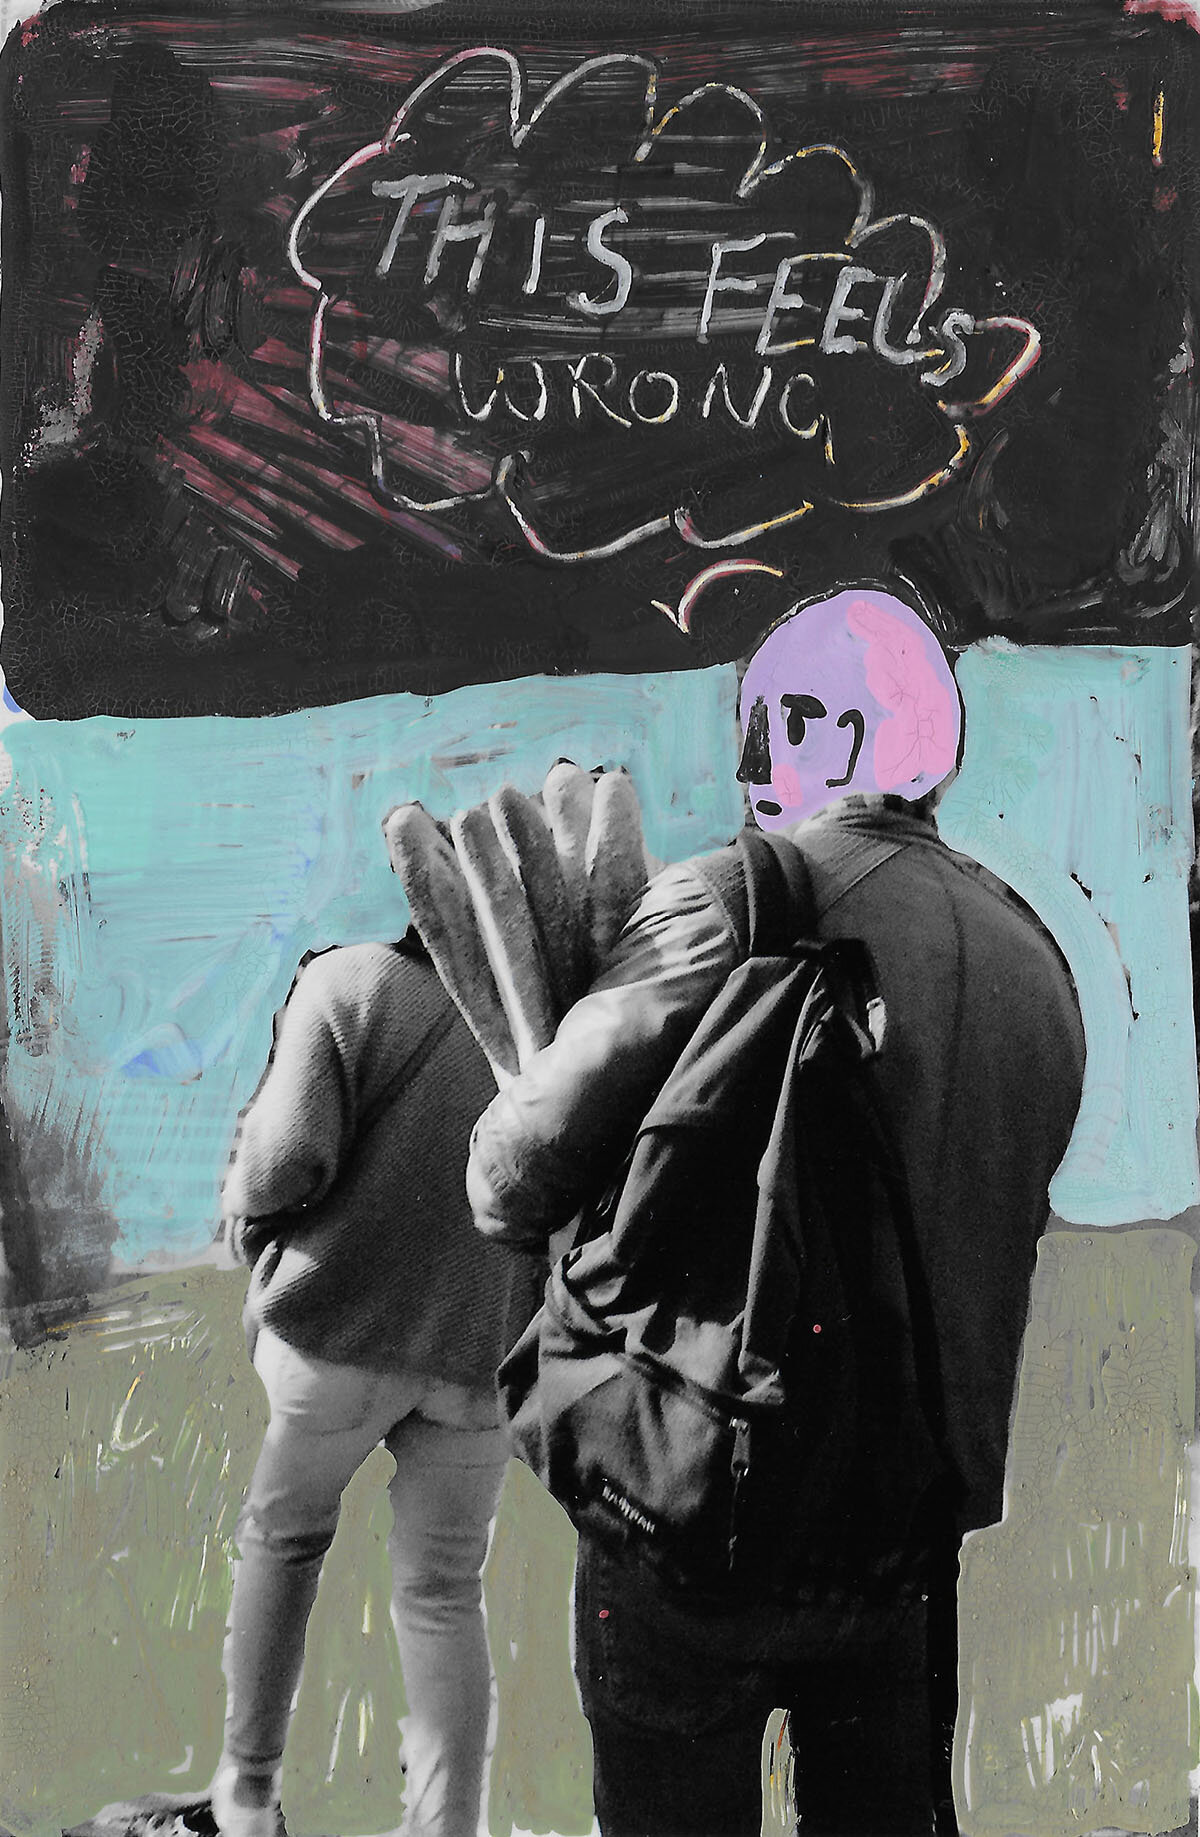 'This Feels Wrong' 2018, Berlin, Inkjet photograph & Acrylic, 10x15cm